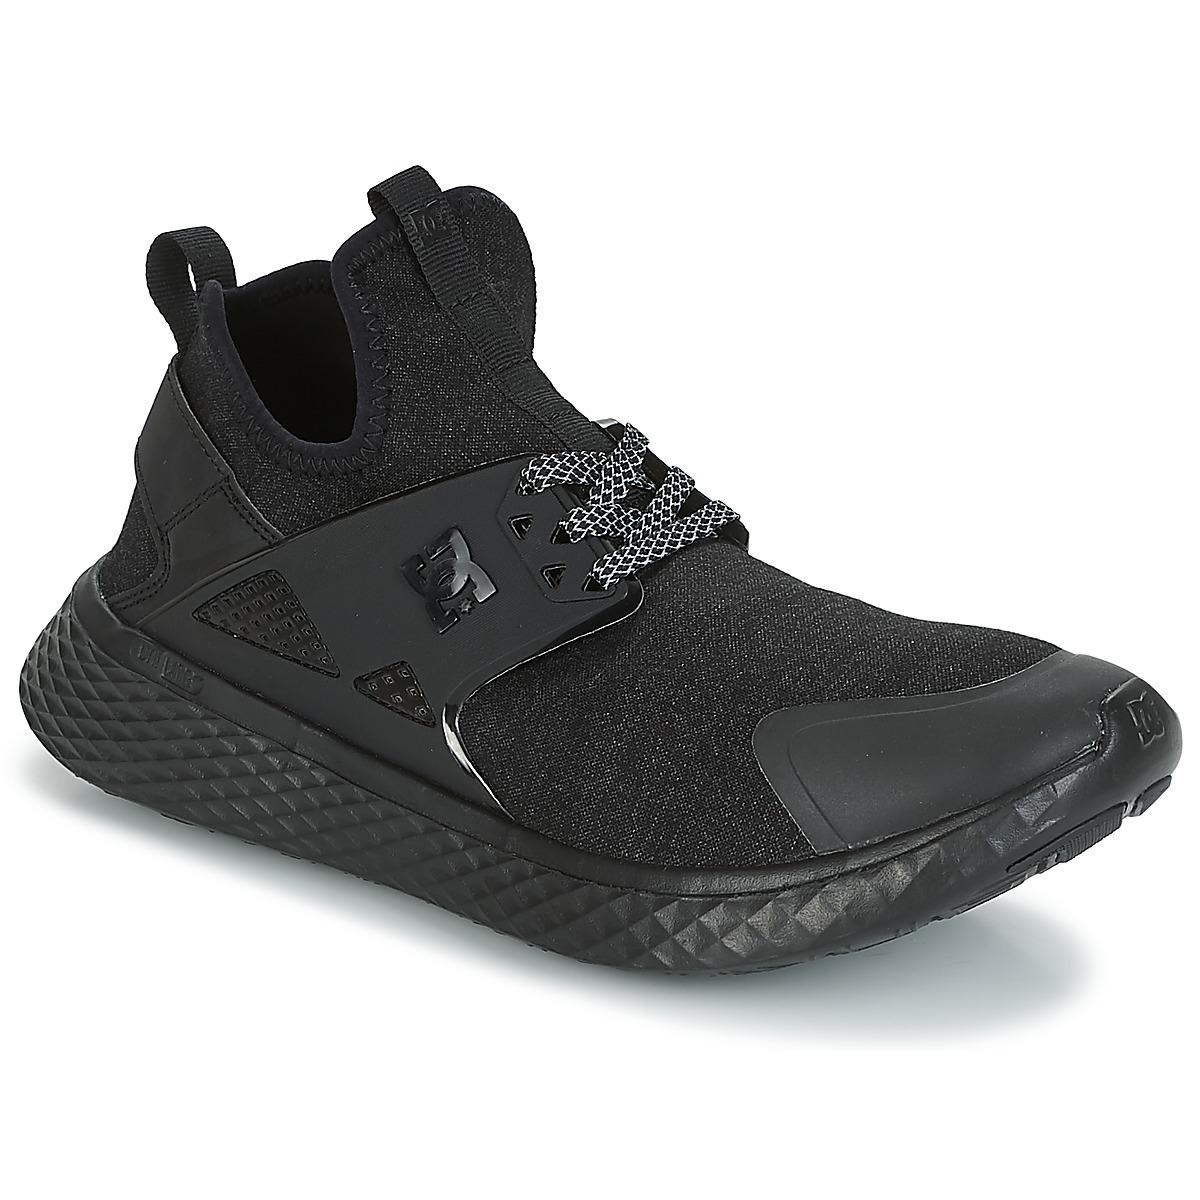 DC Shoes MERIDIAN PRESTI M SHOE 3BK Schwarz - Kostenloser Versand bei Spartoode ! - Schuhe Sneaker Low Herren 83,40 €